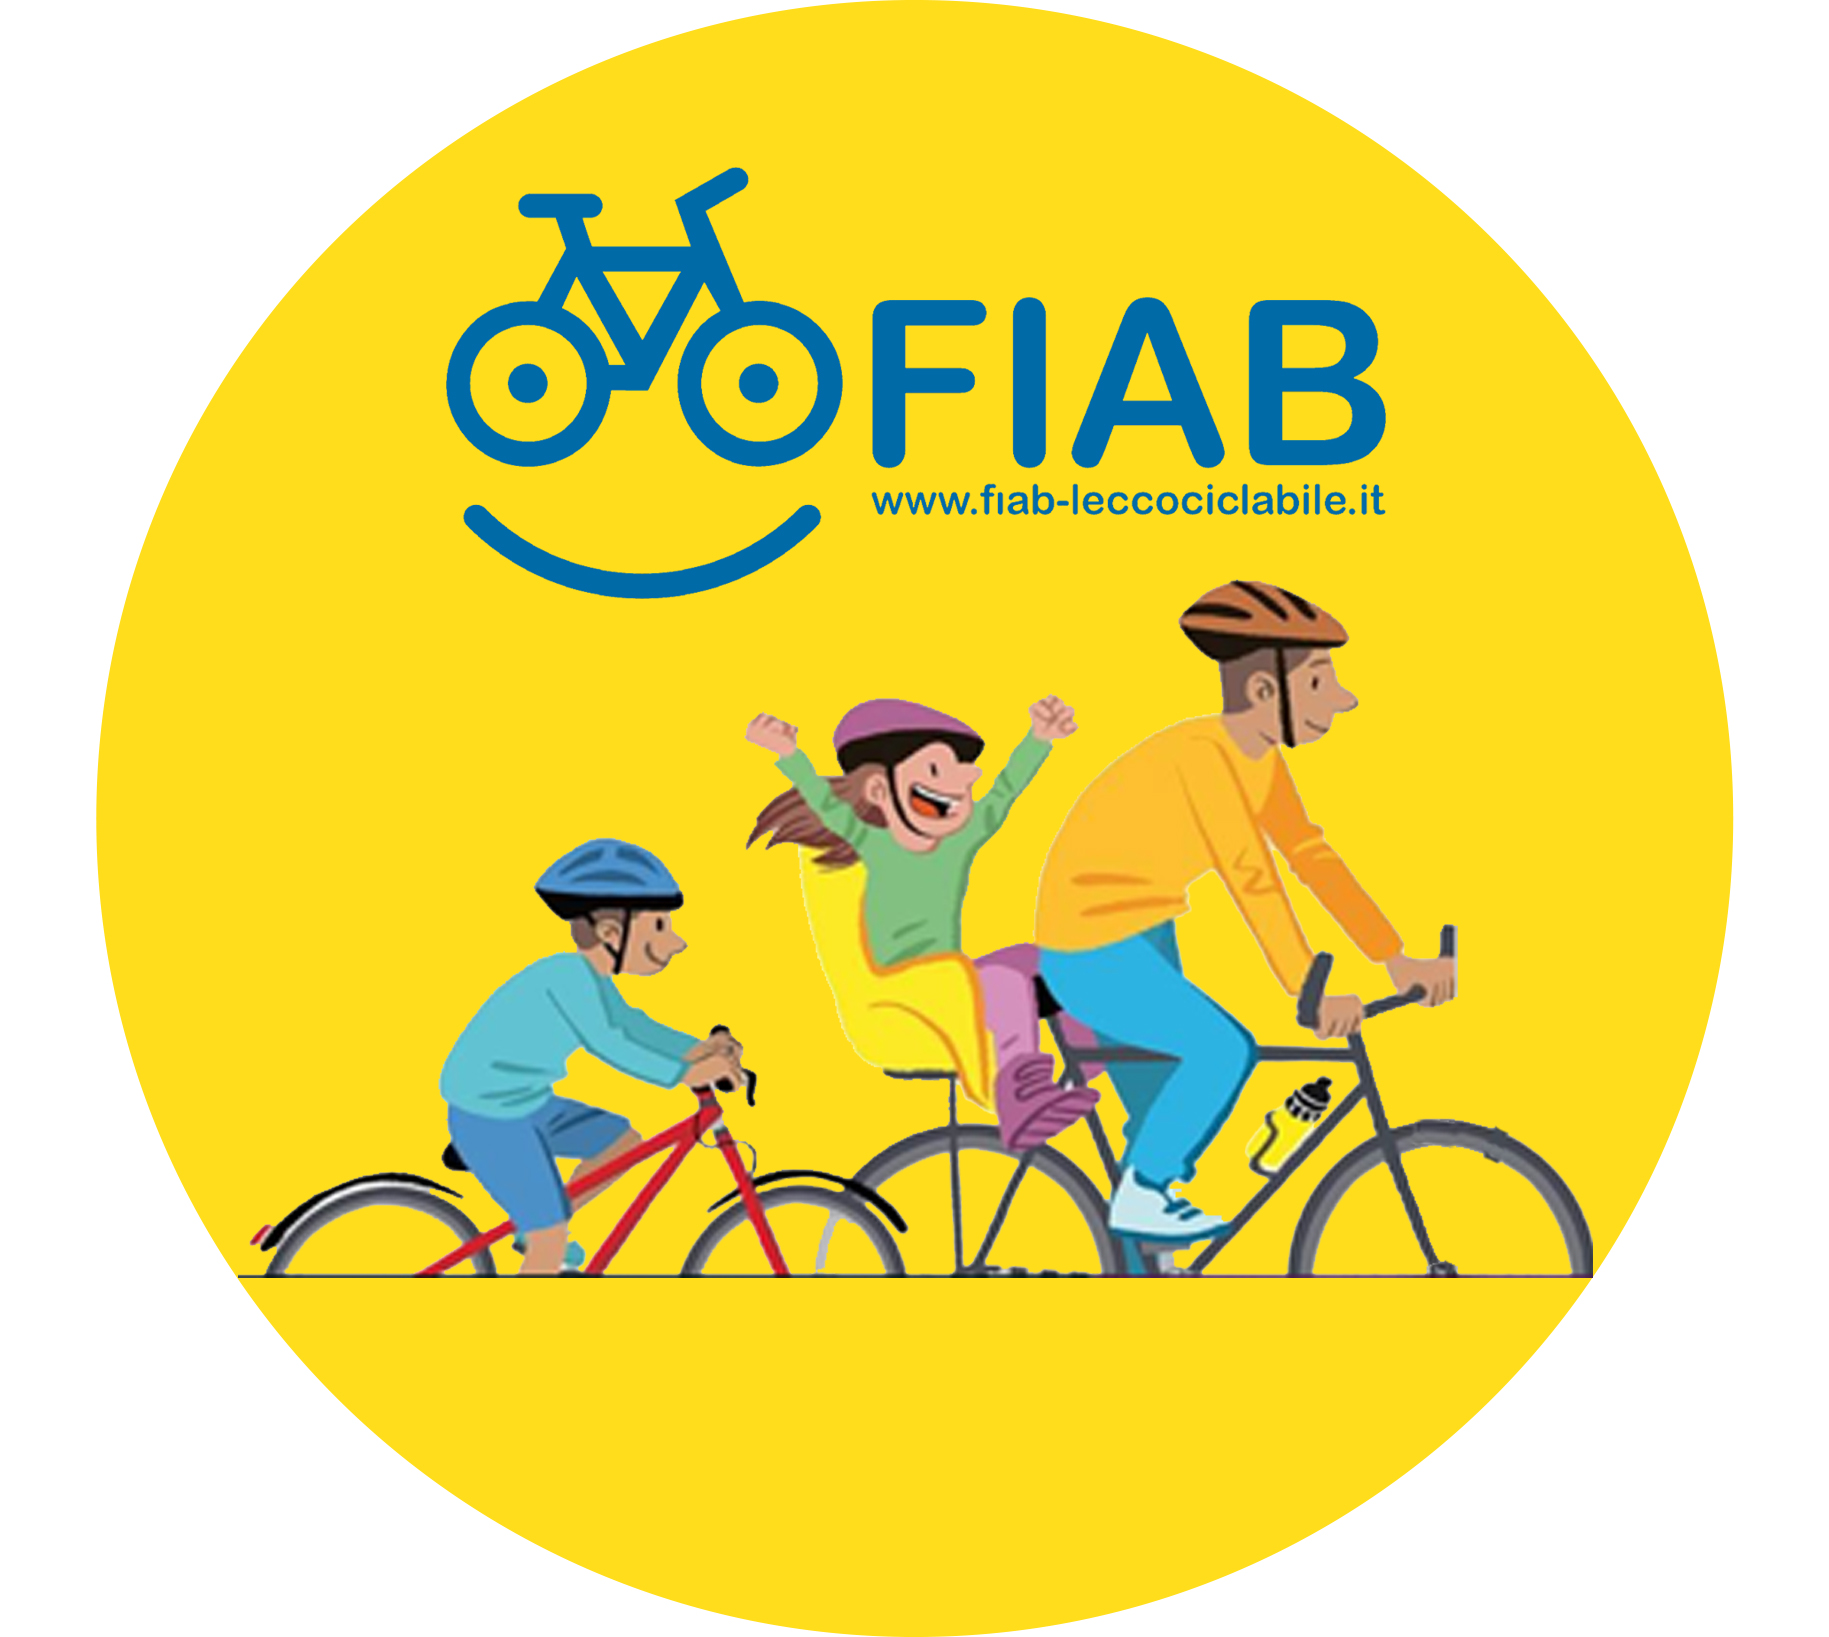 Fiab-LeccoCiclabile